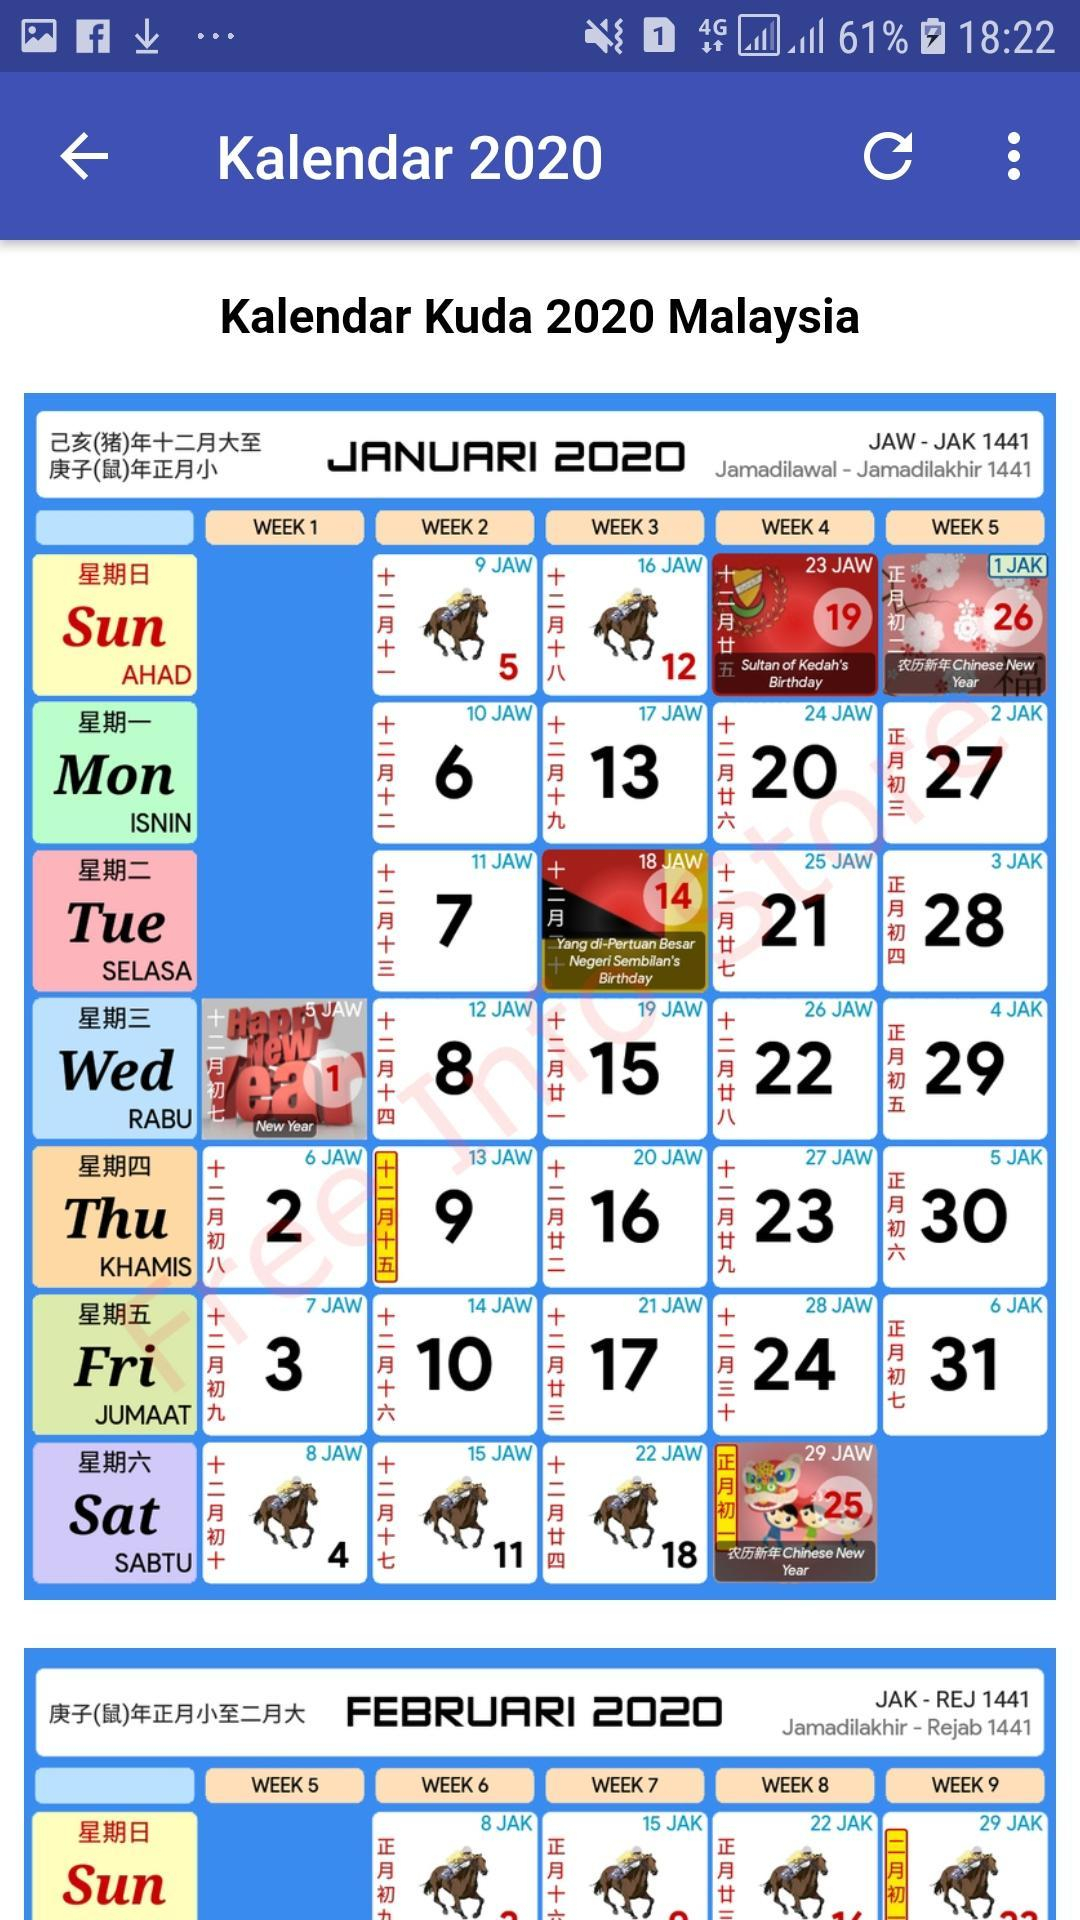 Kalendar Kuda 2020 For Android  Apk Download in Calendar 2020 Kuda